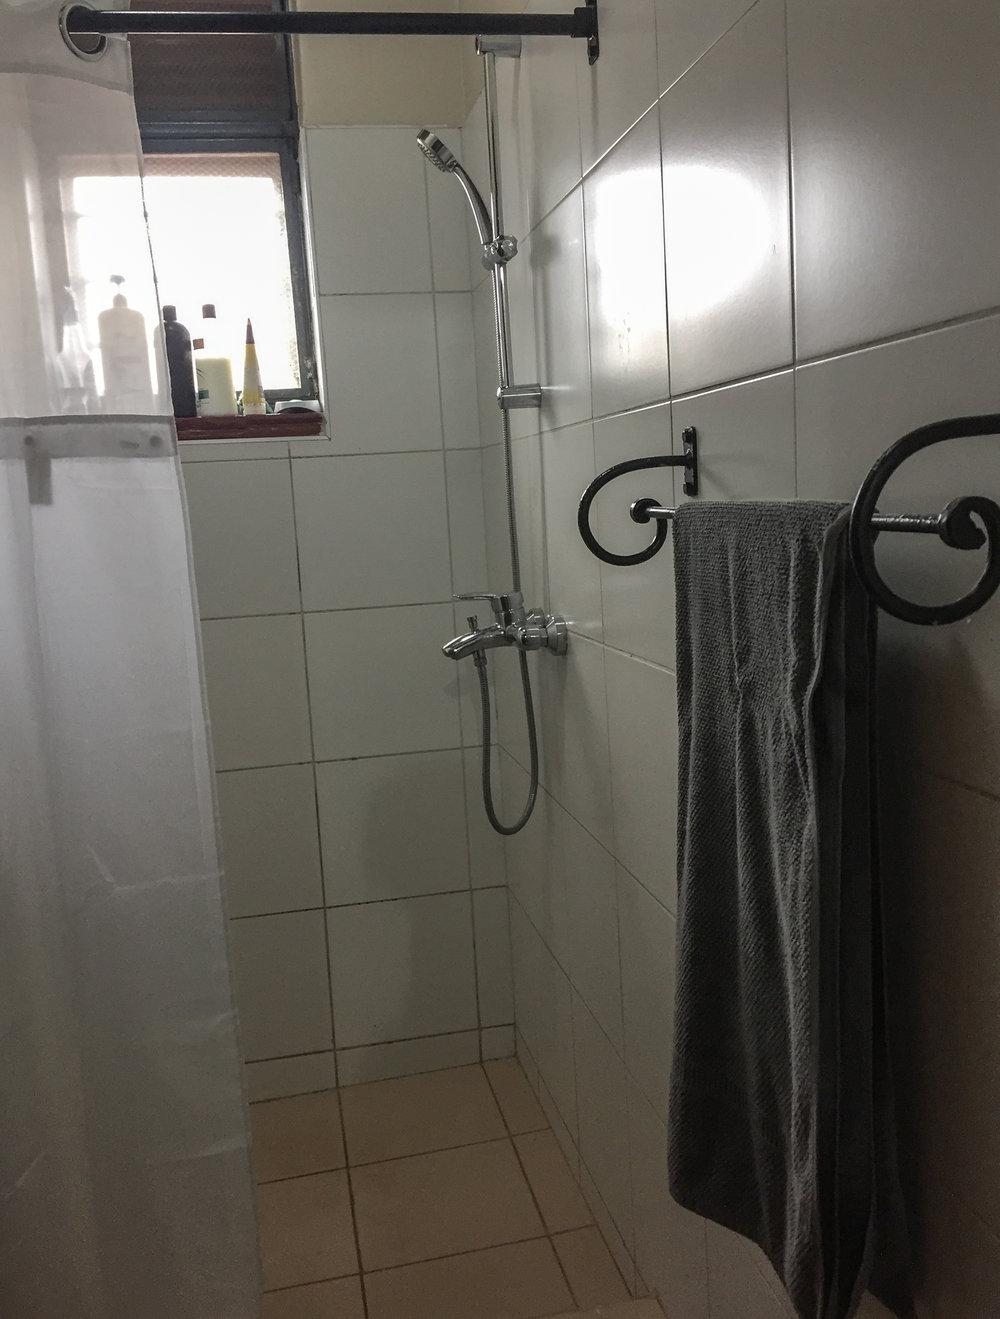 ugandan-shower-room